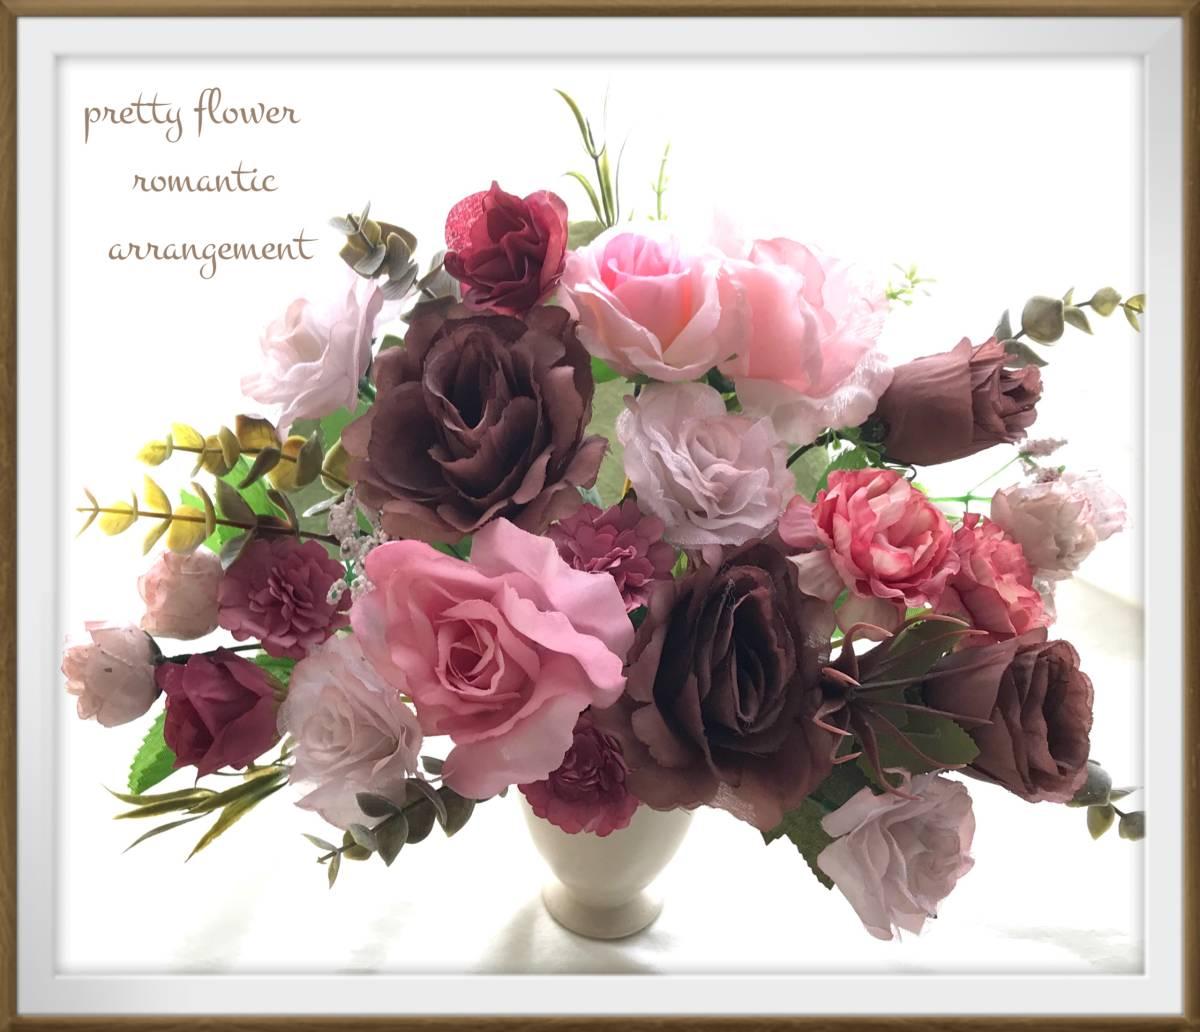 pretty flower����SALE�I�x�[�W���Ԋ�`���R���[�g�u���E���ƃ~���N�e�B�[�s���N���K�N�t�F�~�j���A�����W Image1